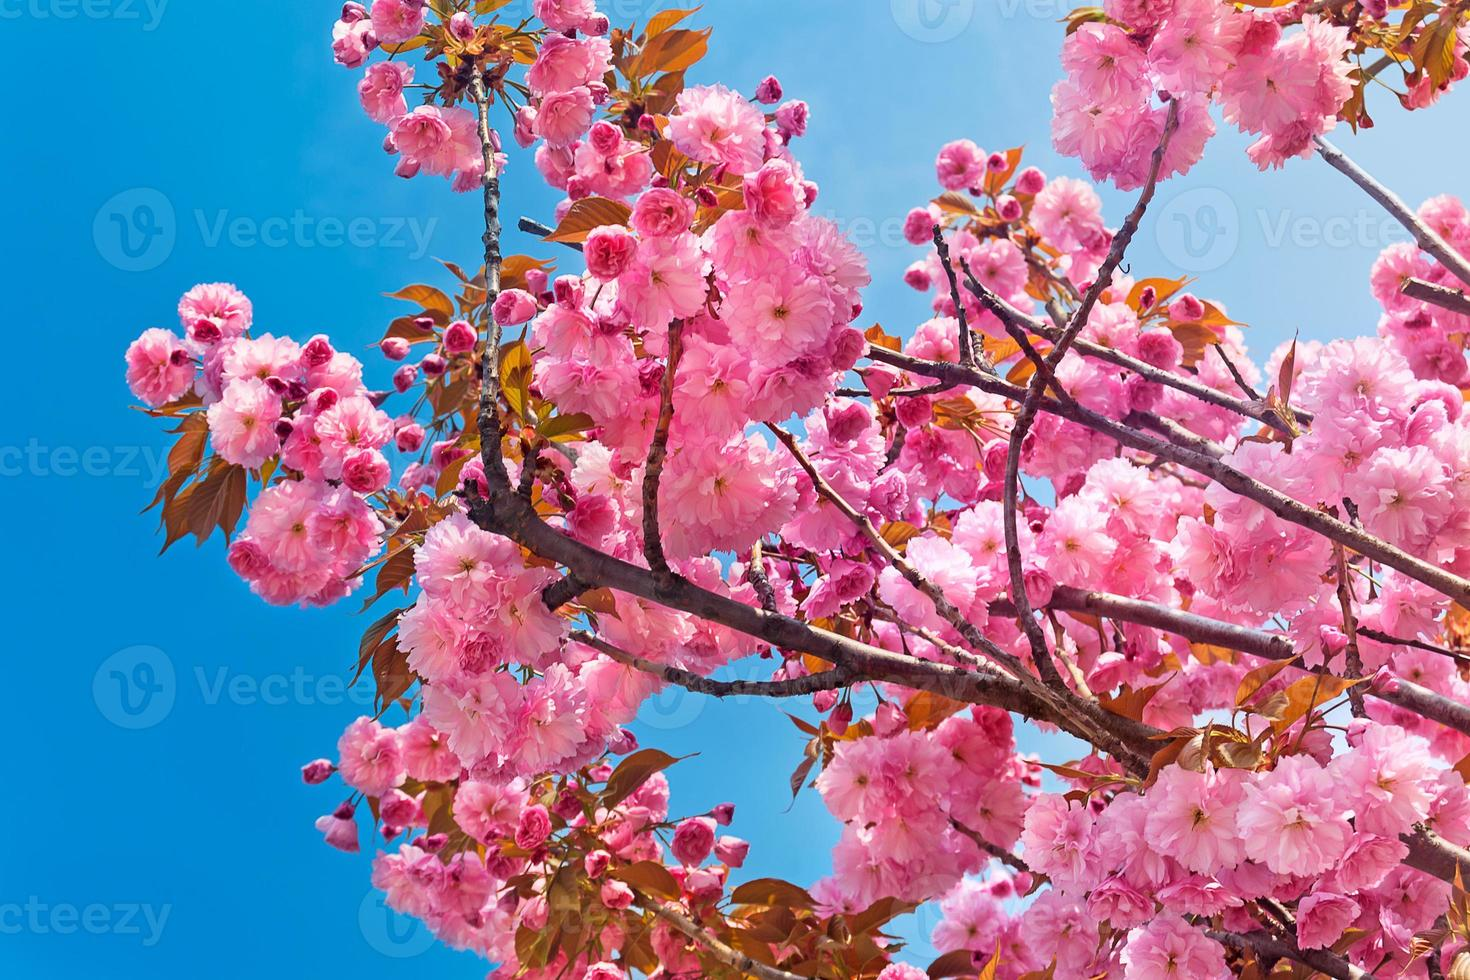 rosa Kirschblüten am schönen Frühlingstag foto